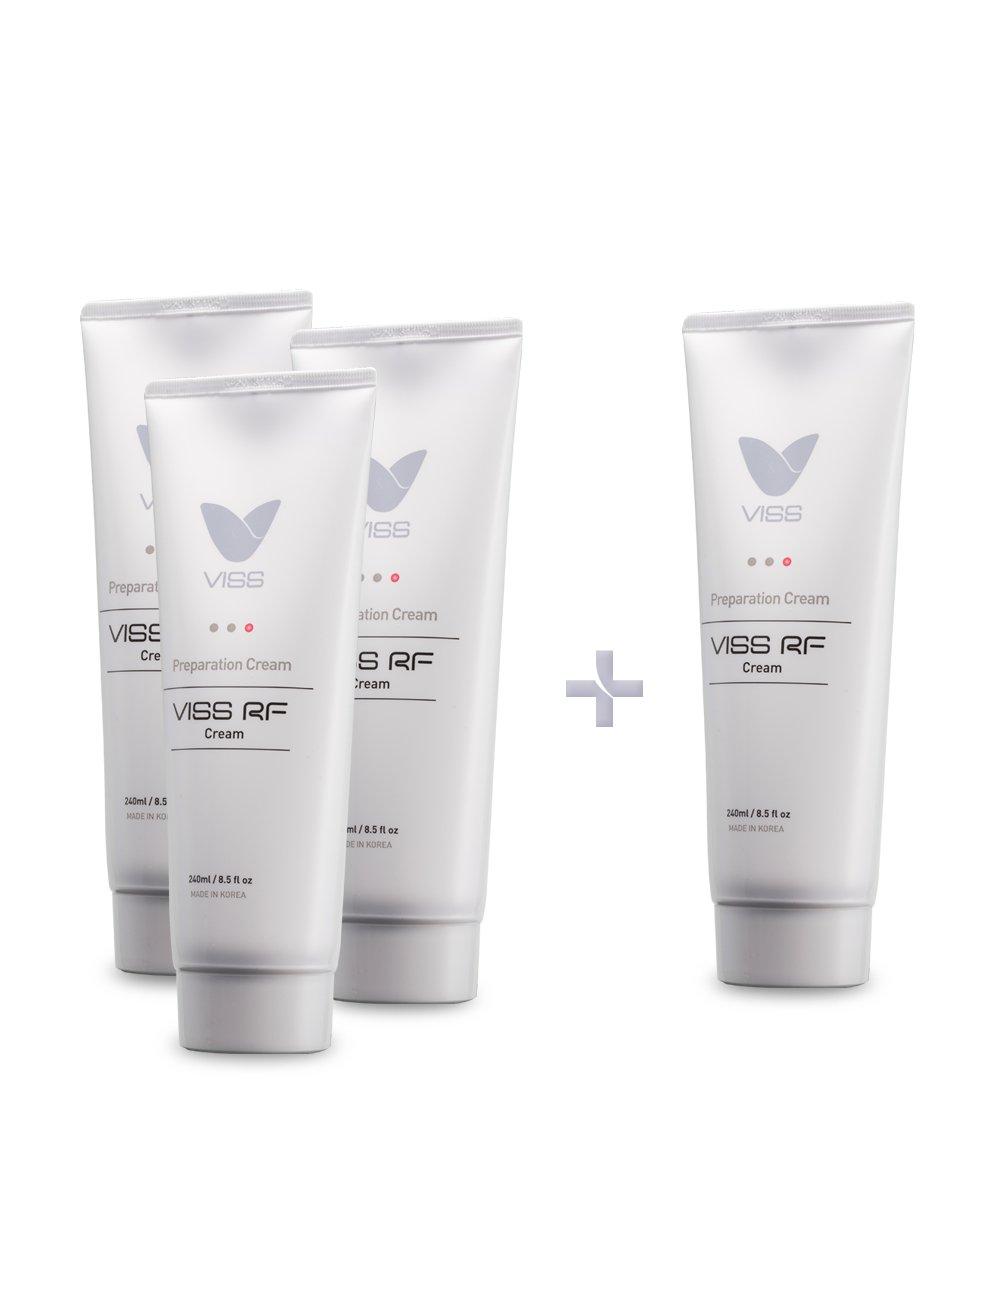 VISS RF High frequency Massage Cream & Moisturizer 3+1 package by VISS